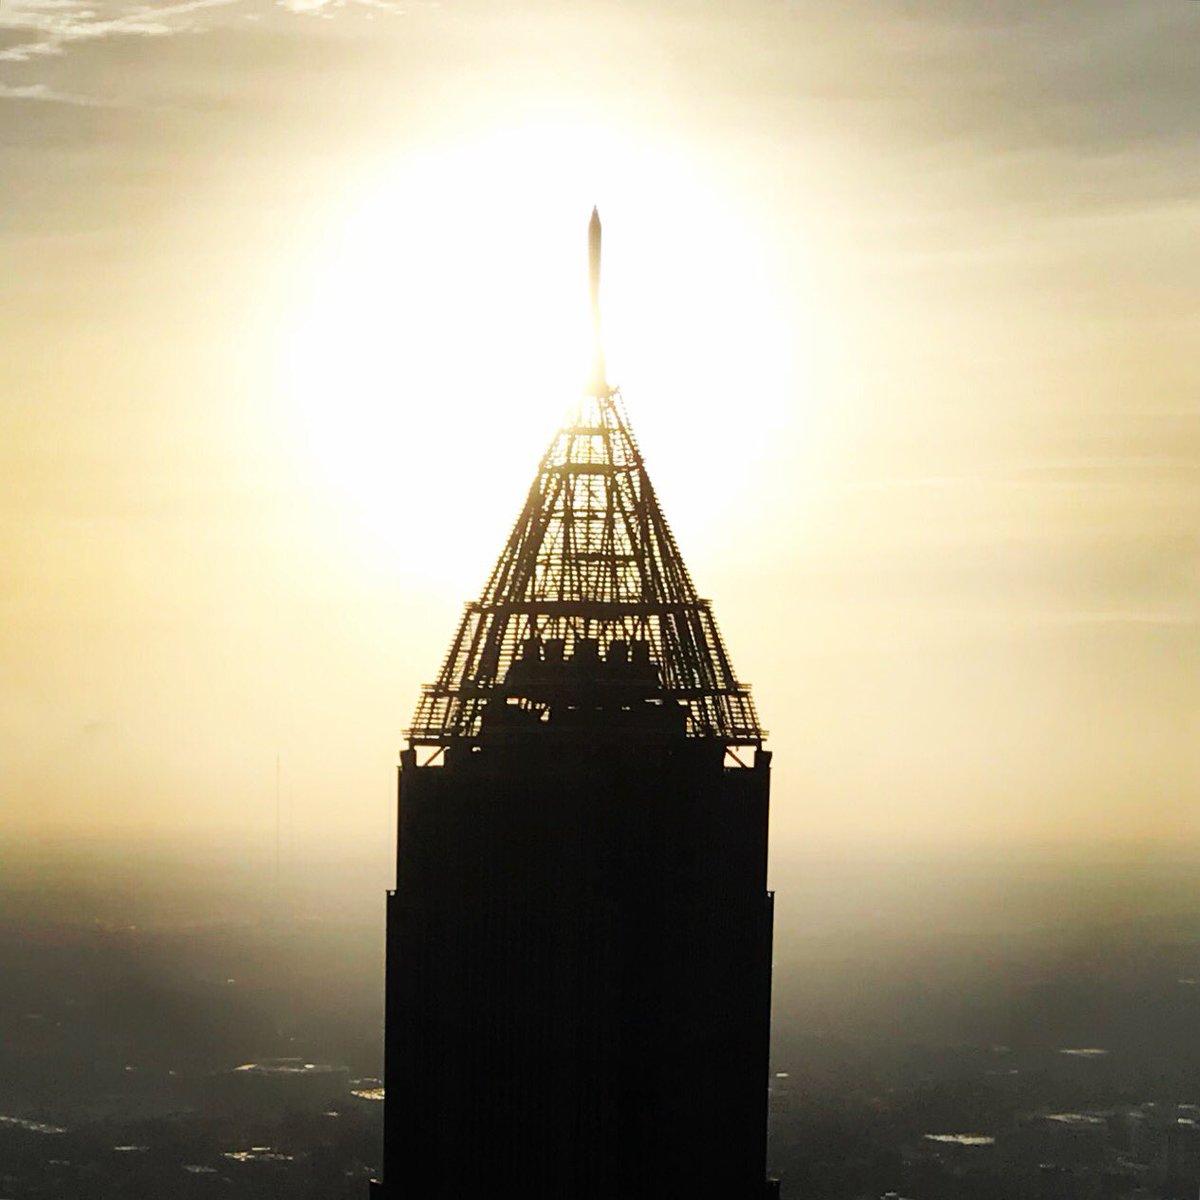 Welcome back to the ☀� over @BoAPlazaAtlanta in the morning! @wsbradio #SkyCopter @wsbtv #CaptnCam view